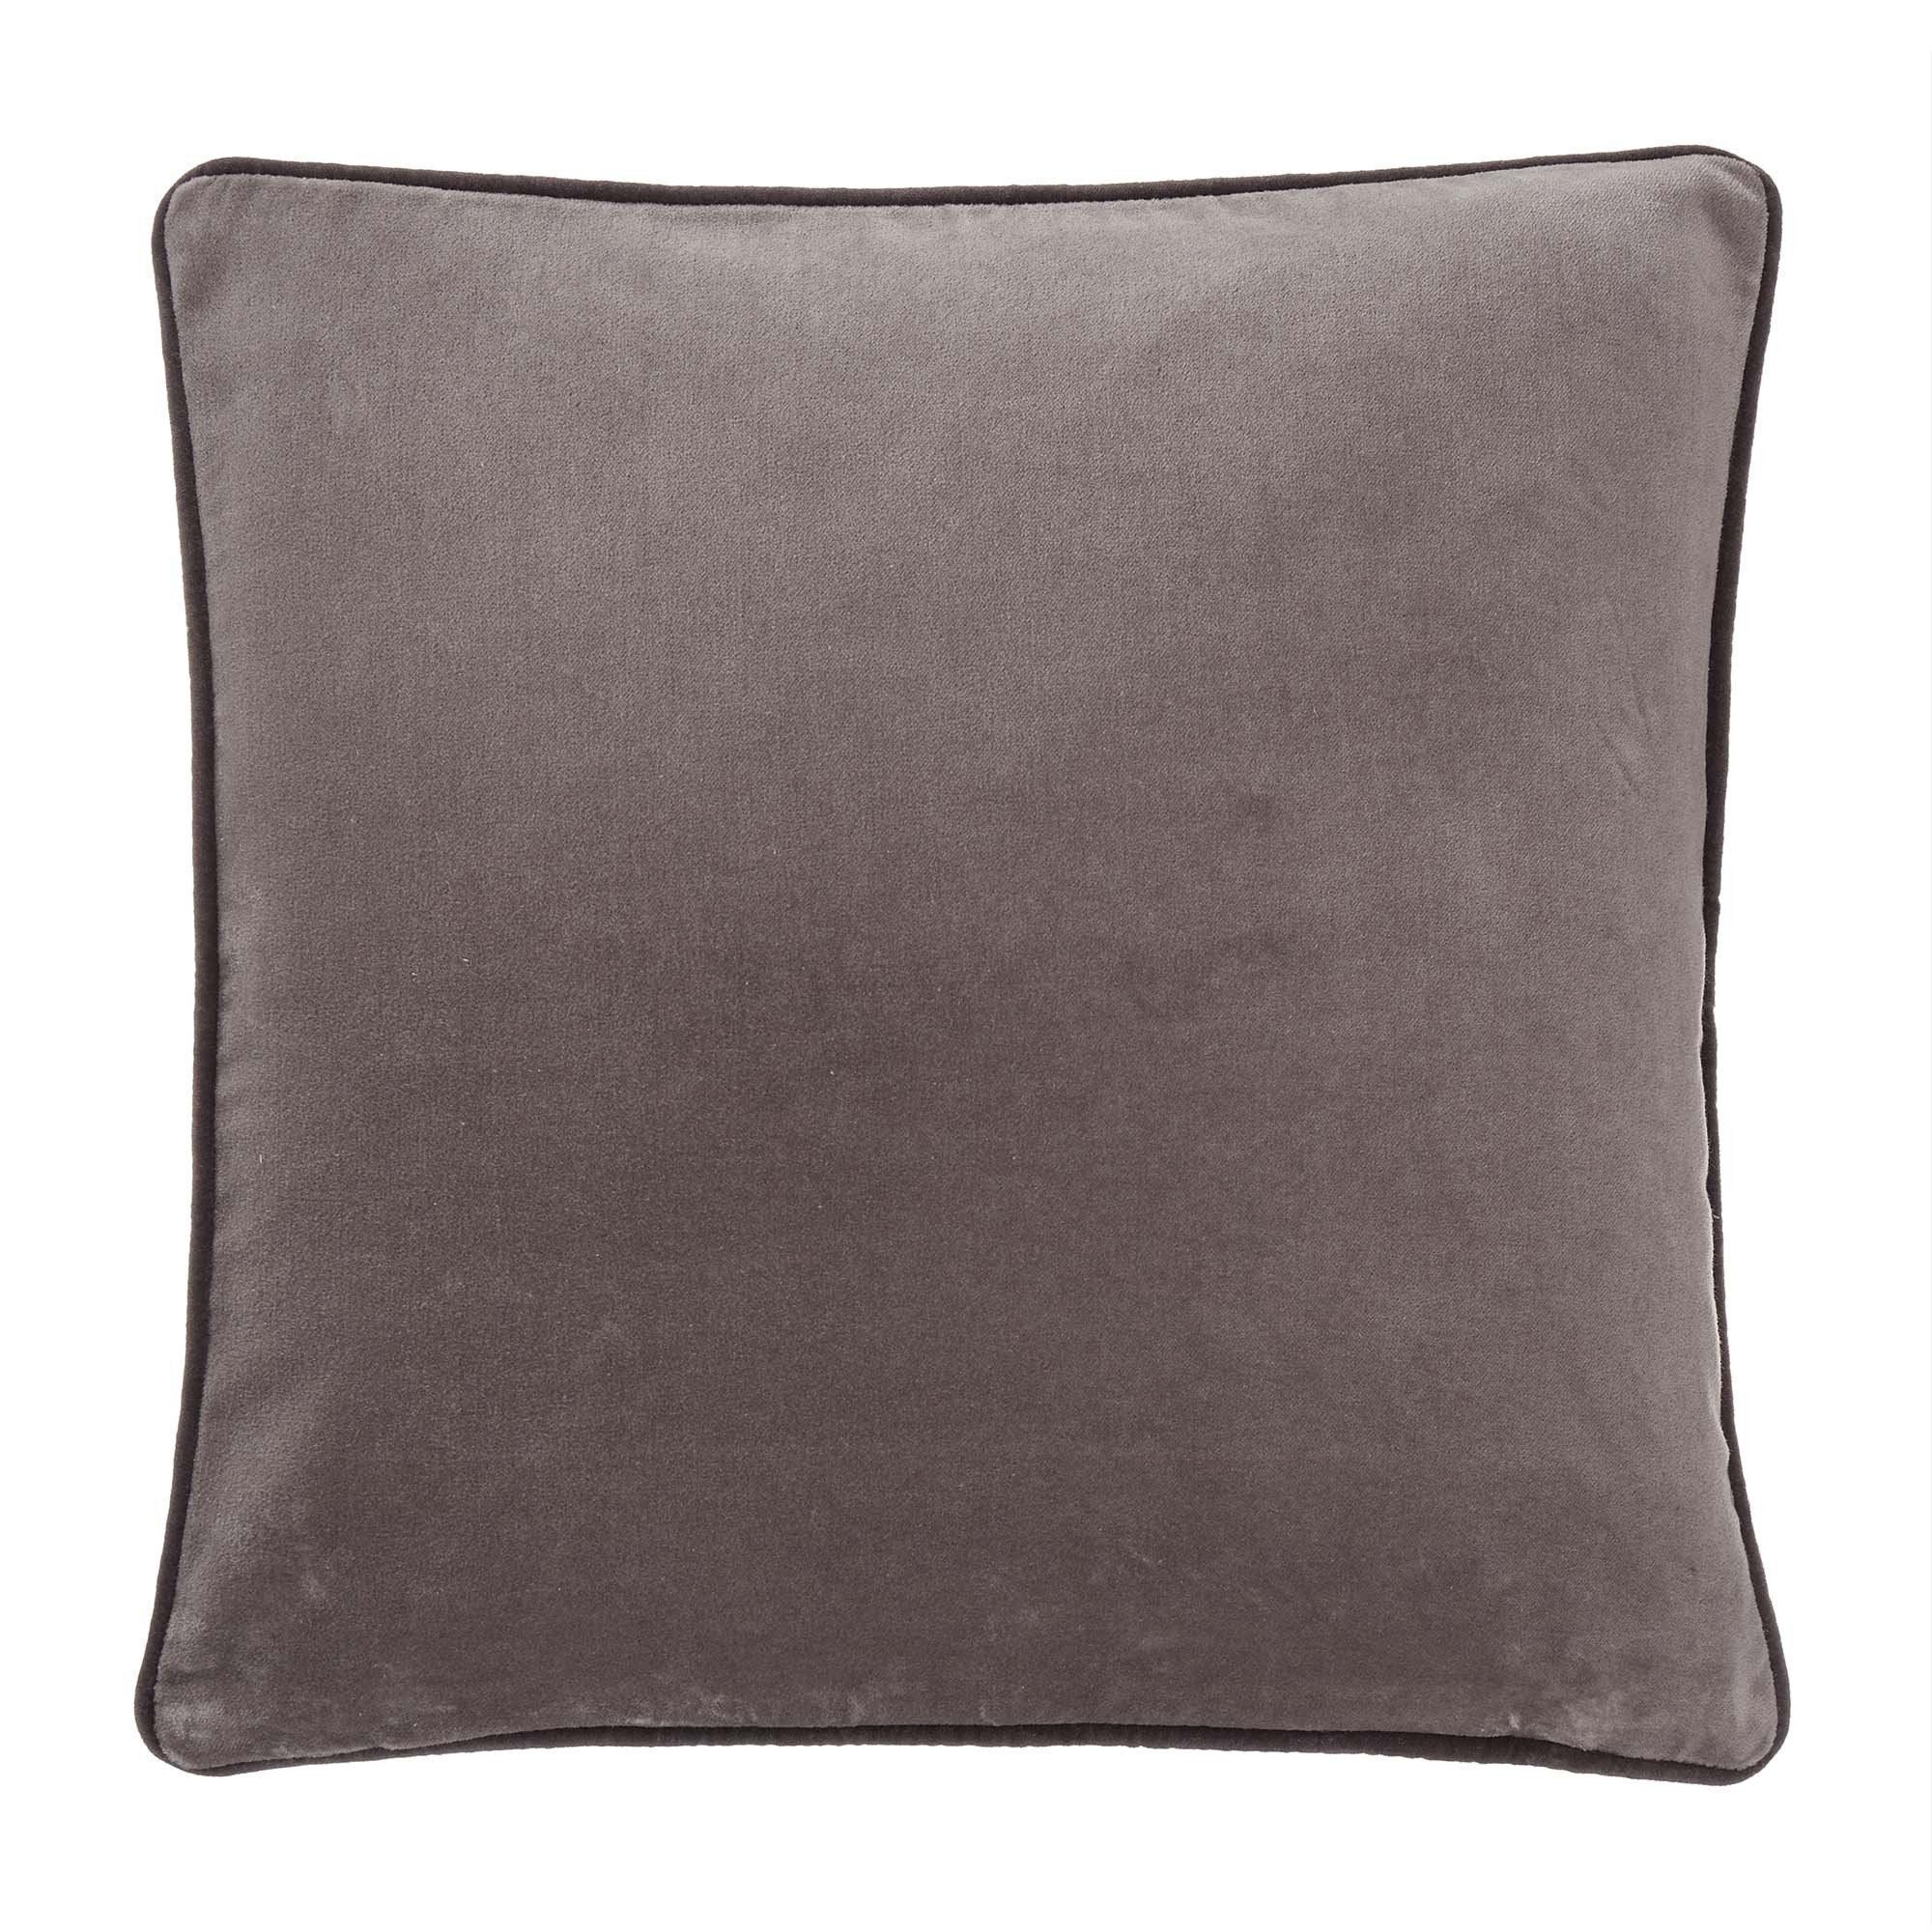 Kissenhulle Suri Grau Dunkelgrau 45x45 Cm Kissenhullen